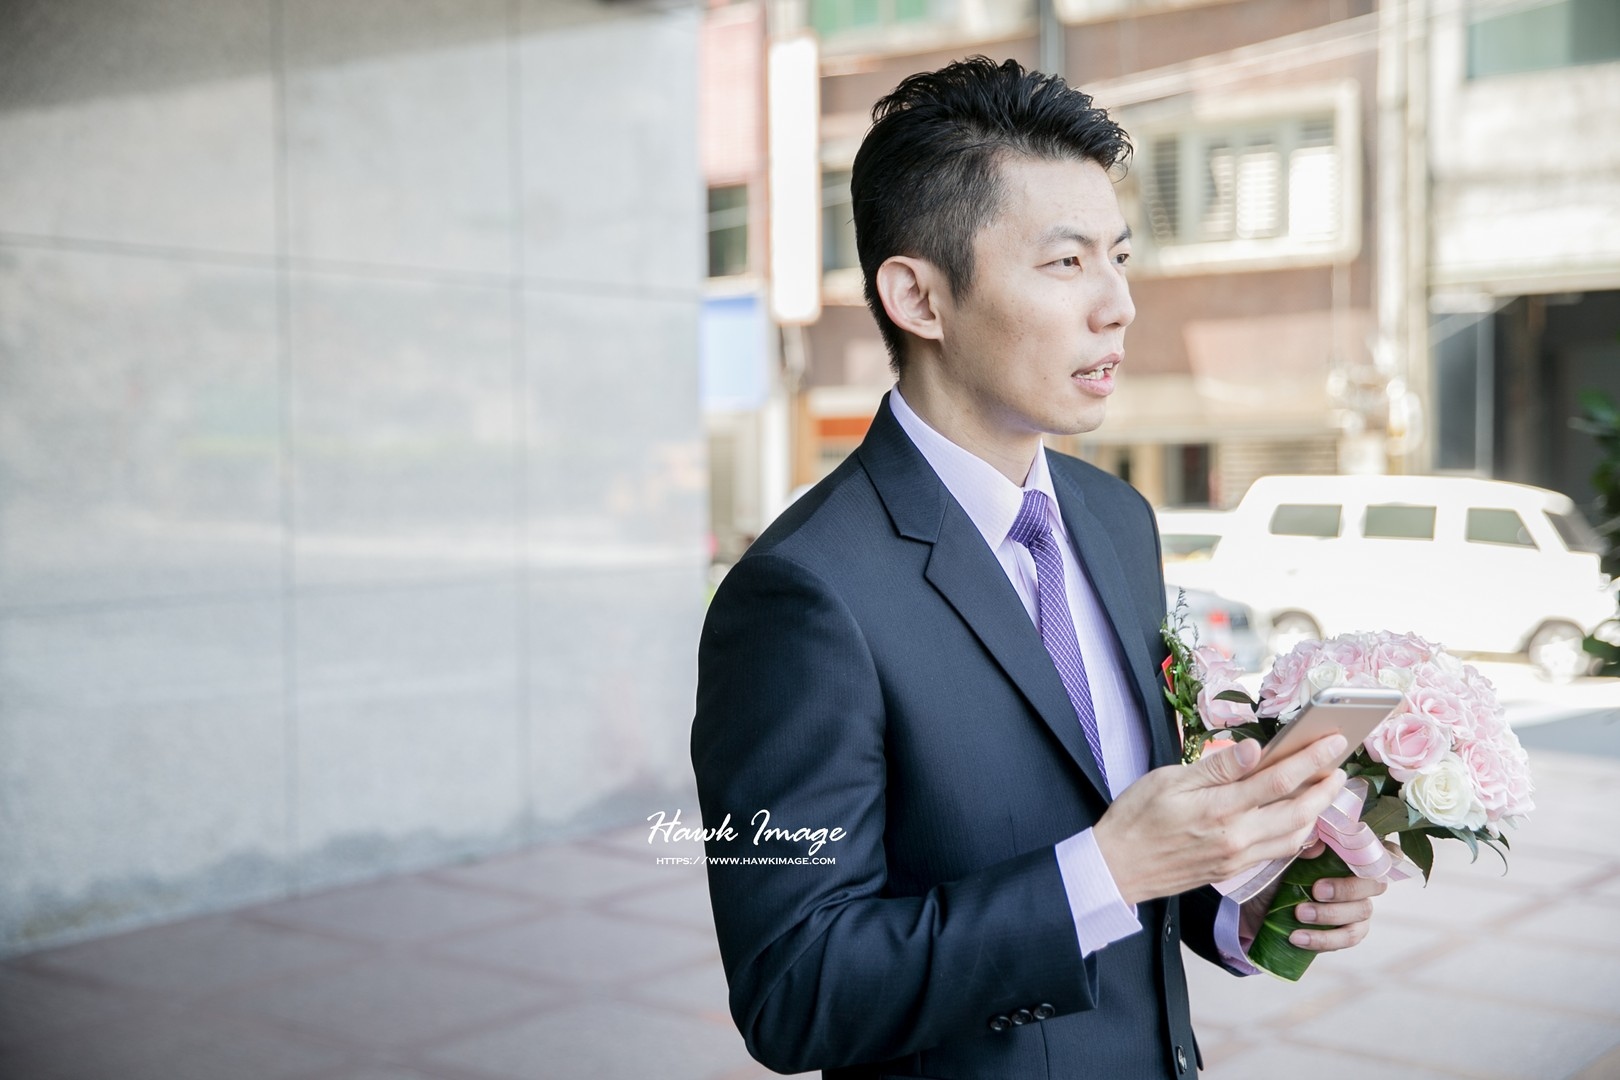 wedding-photo[婚攝] 結婚迎娶by婚攝浩克Hawk